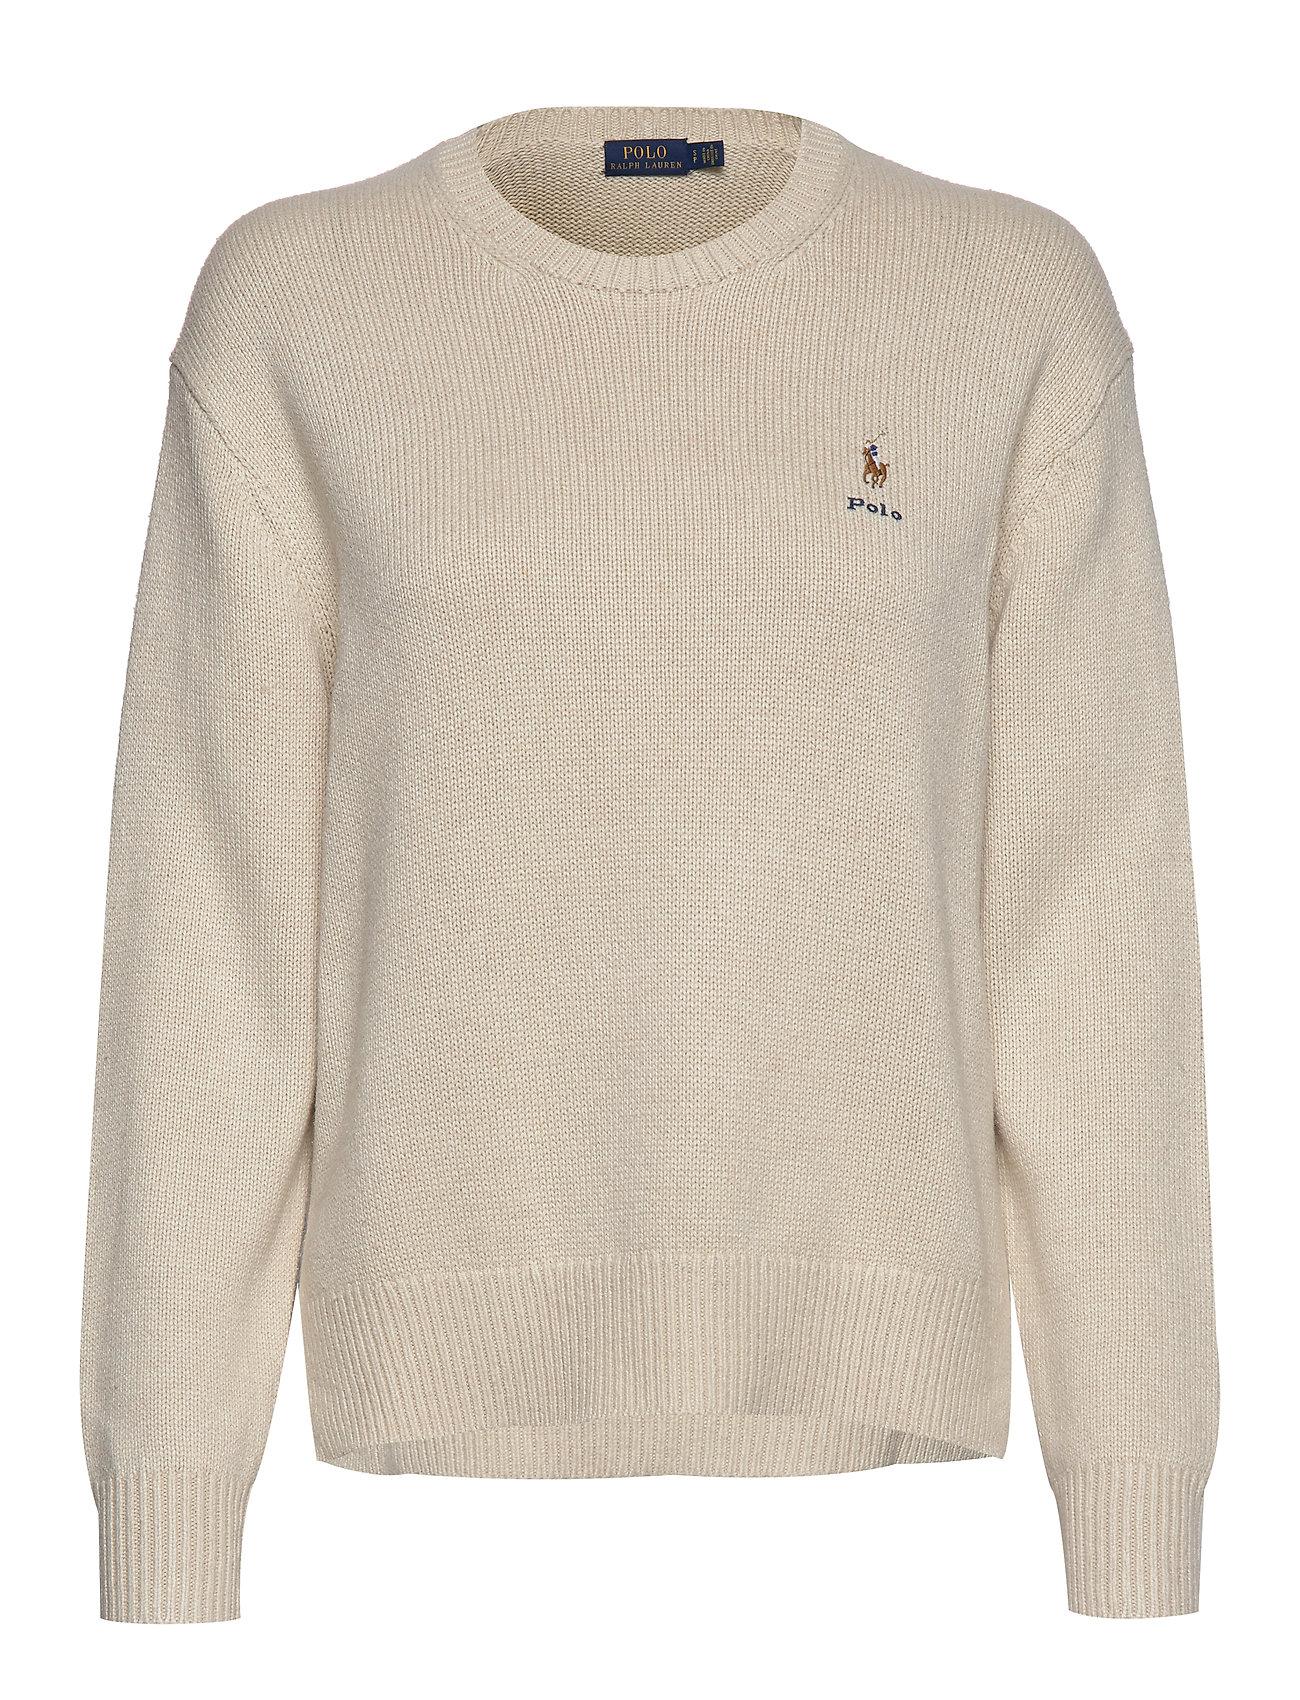 Polo Ralph Lauren Silk Crewneck Sweater - DARK ENGLISH CREA